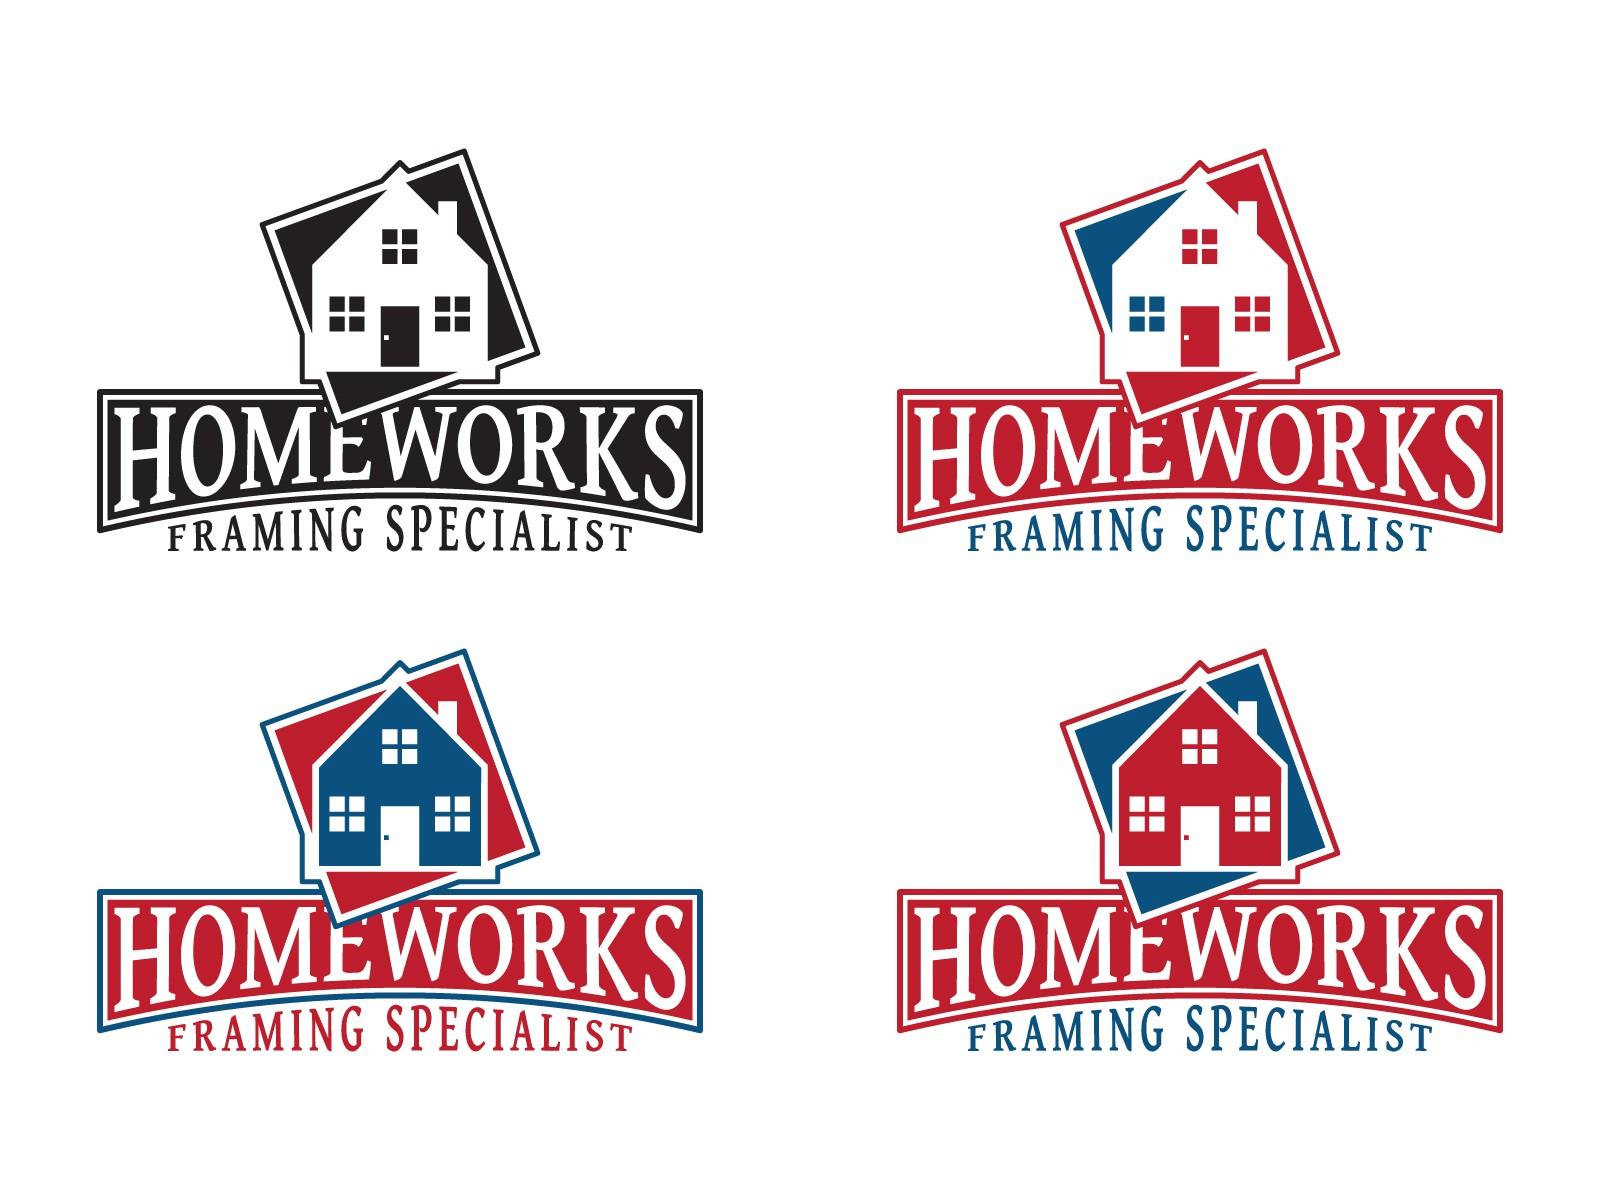 Create the next logo for Homeworks Framing Specialist